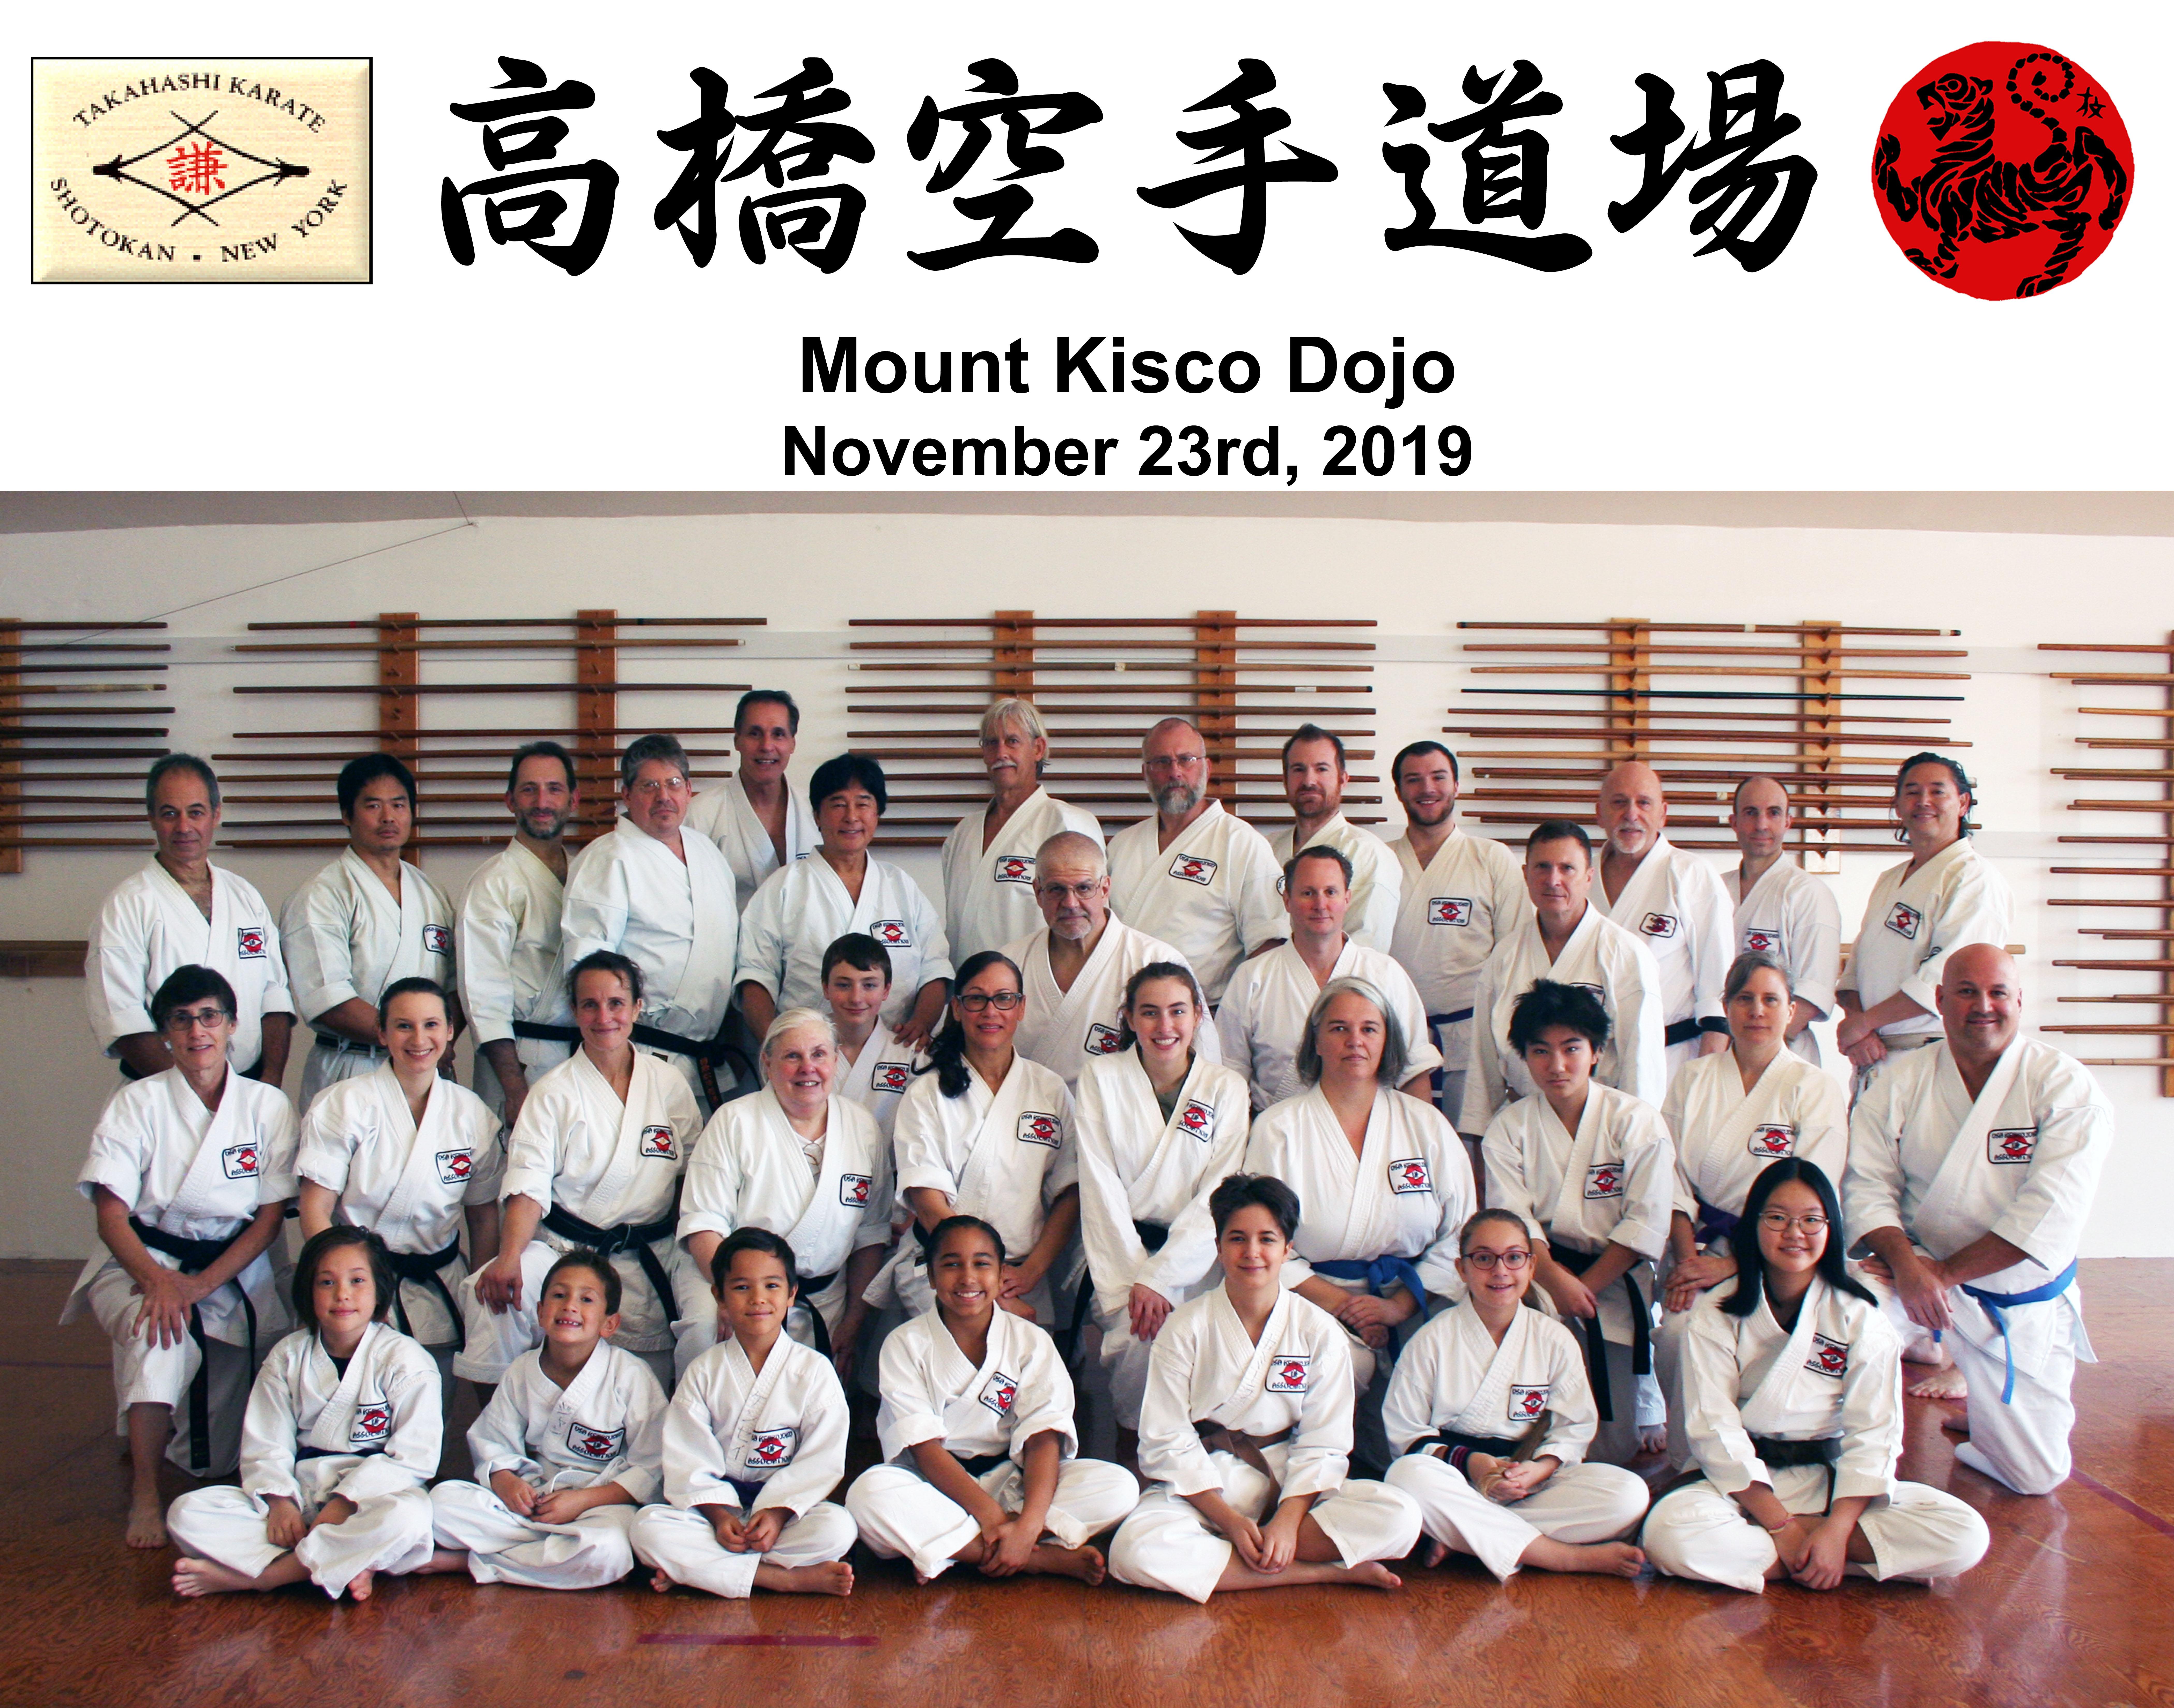 Takahashi Dojo, Mt Kisco, 2019